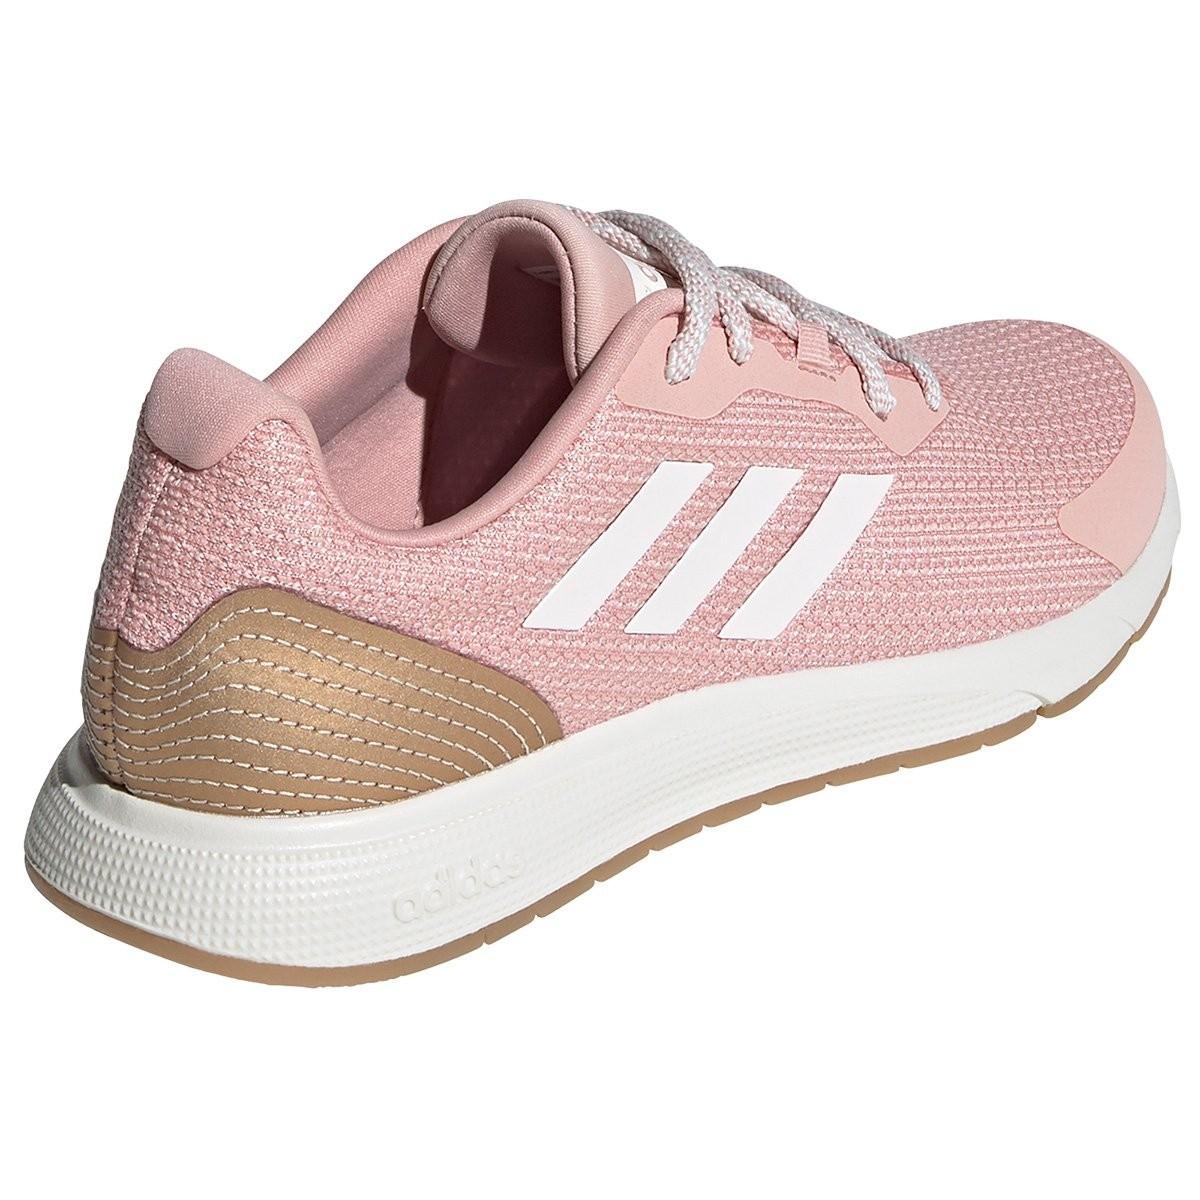 Tenis Feminino Esportivo Adidas Sooraj Rosa - Adulto